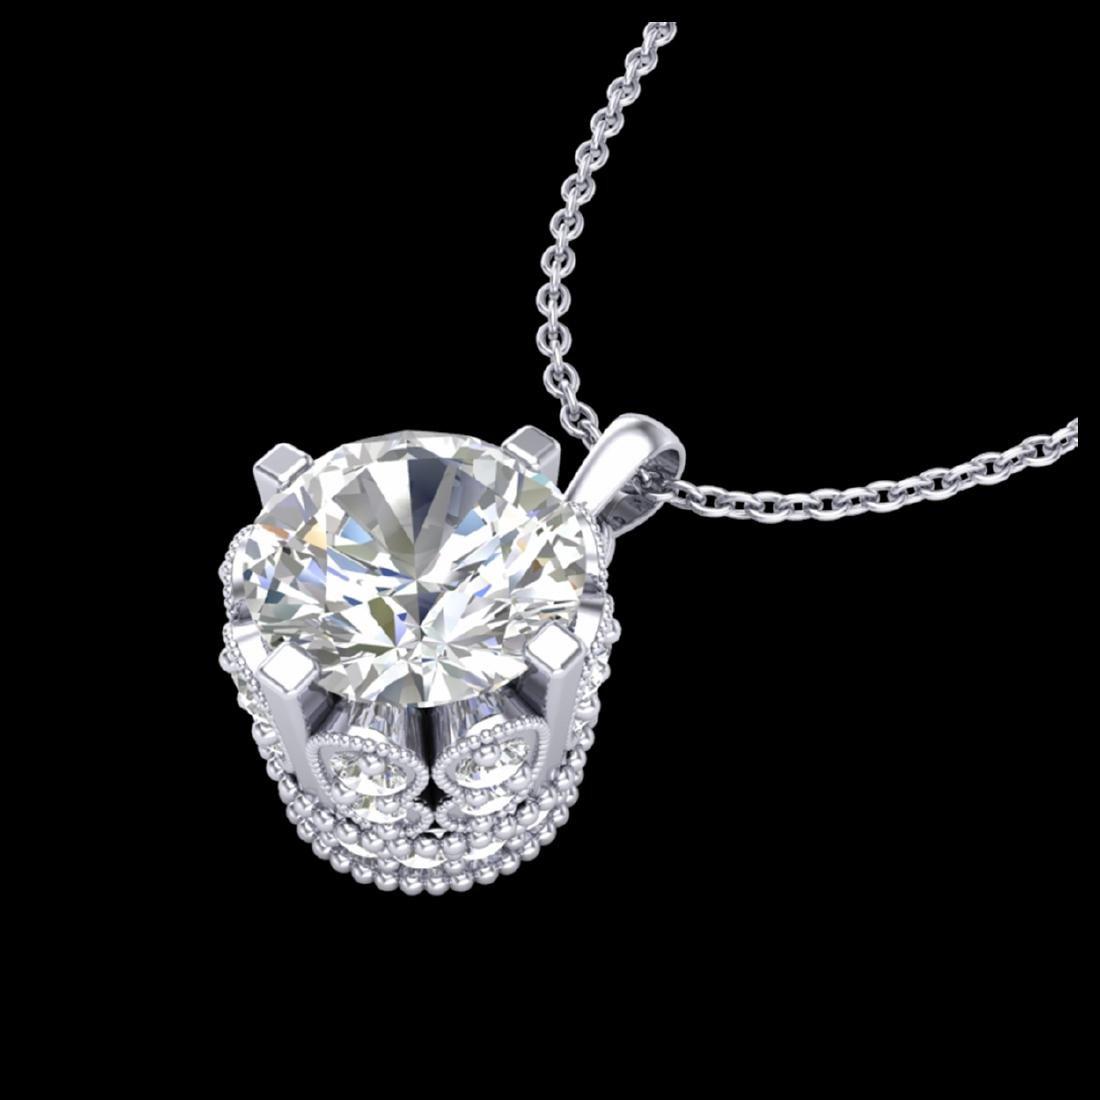 1.14 CTW VS/SI Diamond Solitaire Stud Necklace 18K Gold - 2